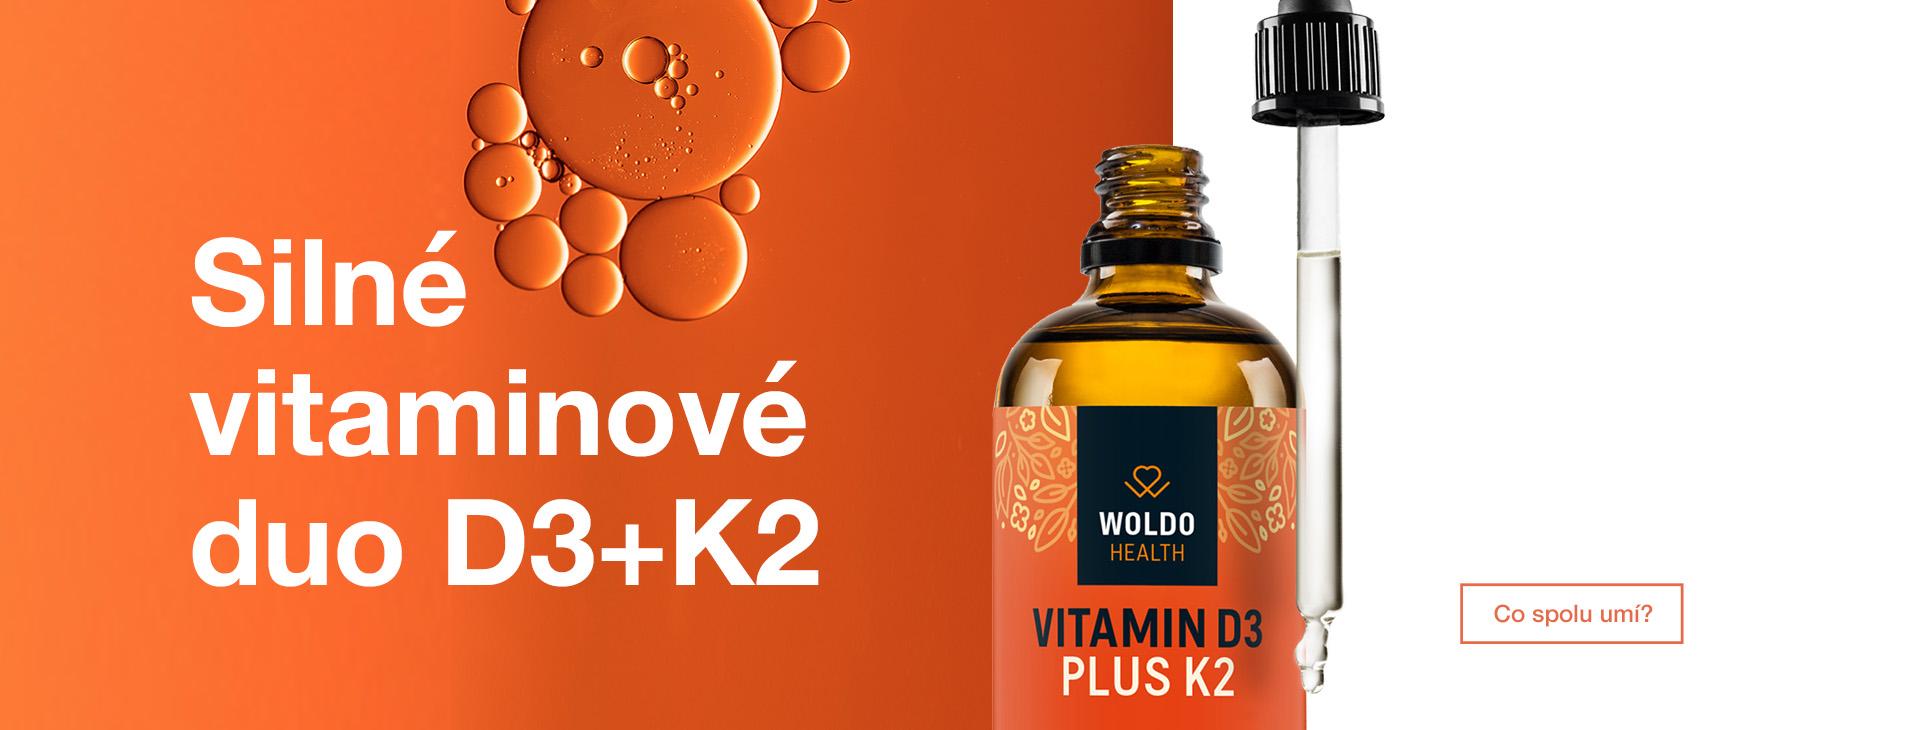 Silné vitaminové duo D3+K2